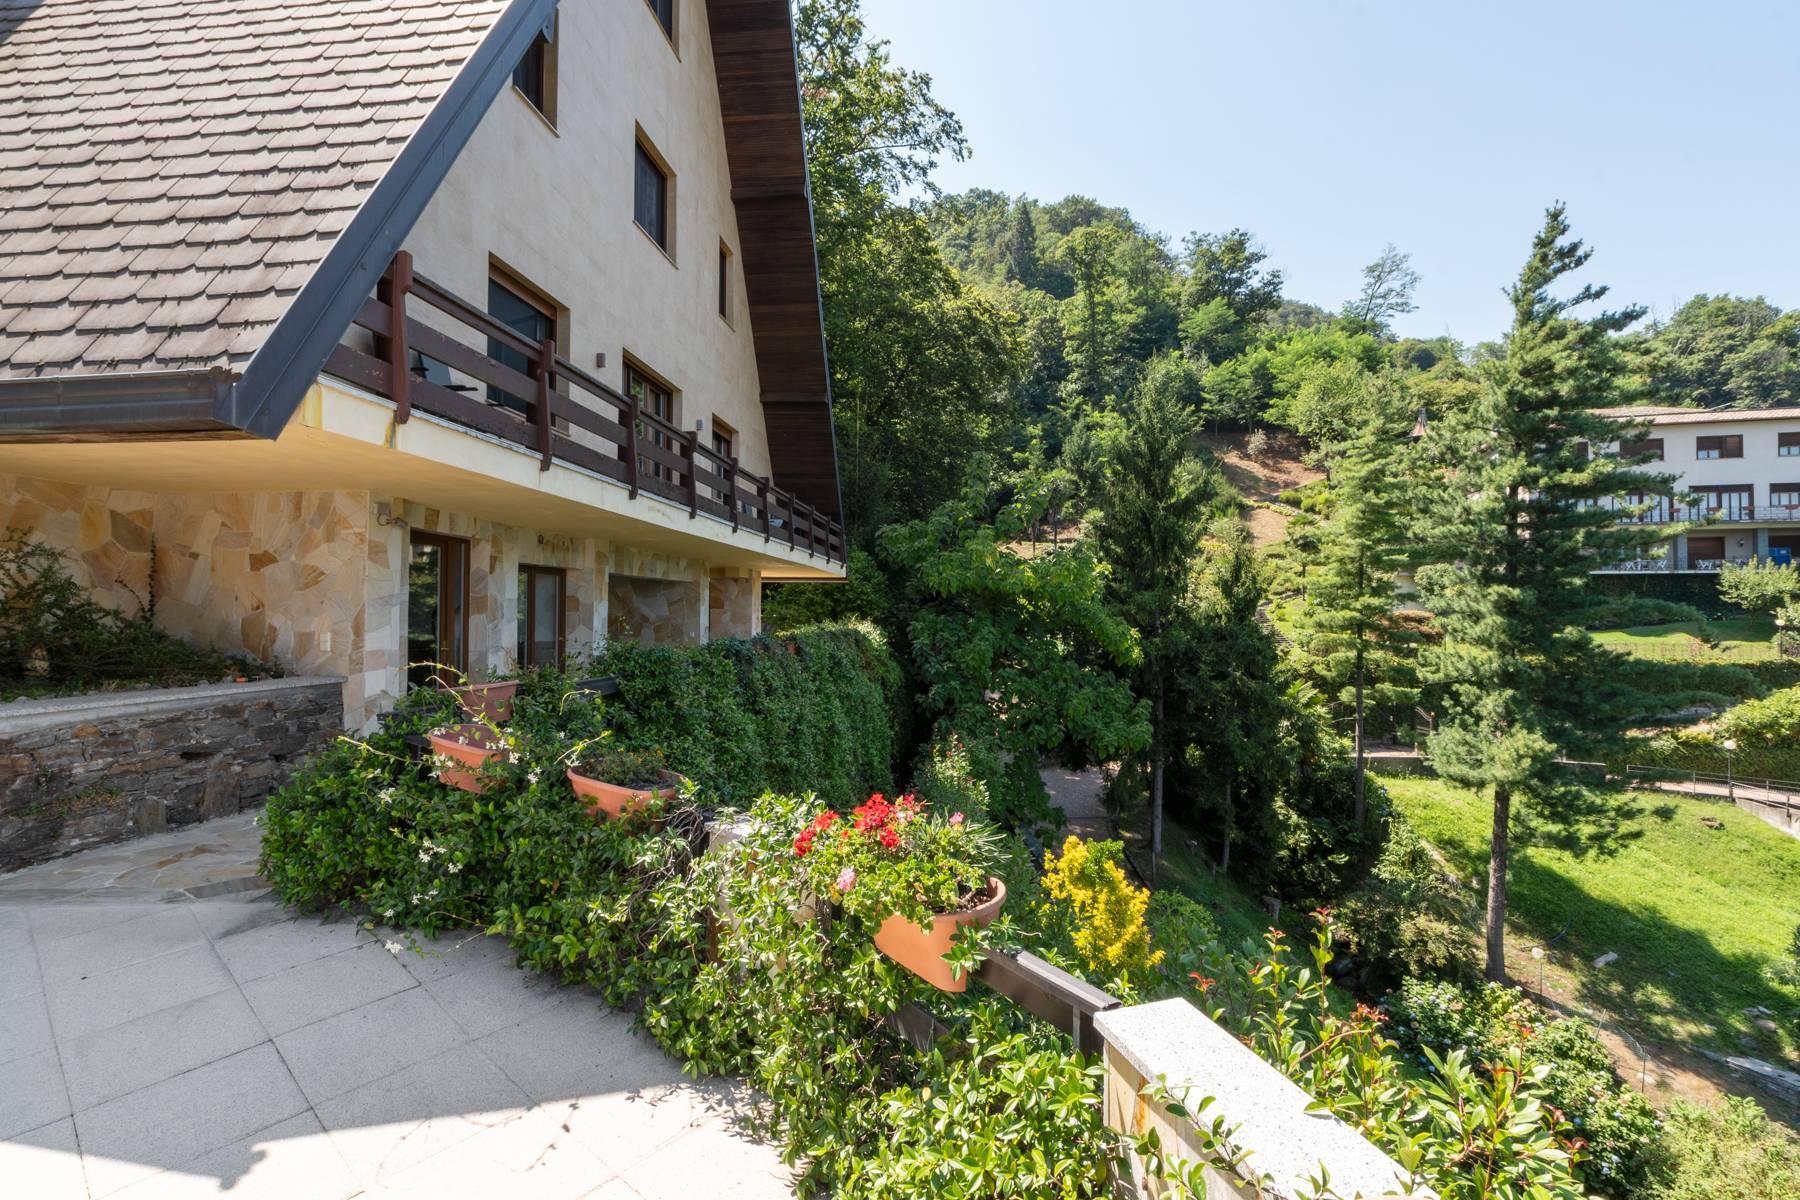 Villa in Vendita a Stresa: 5 locali, 364 mq - Foto 10